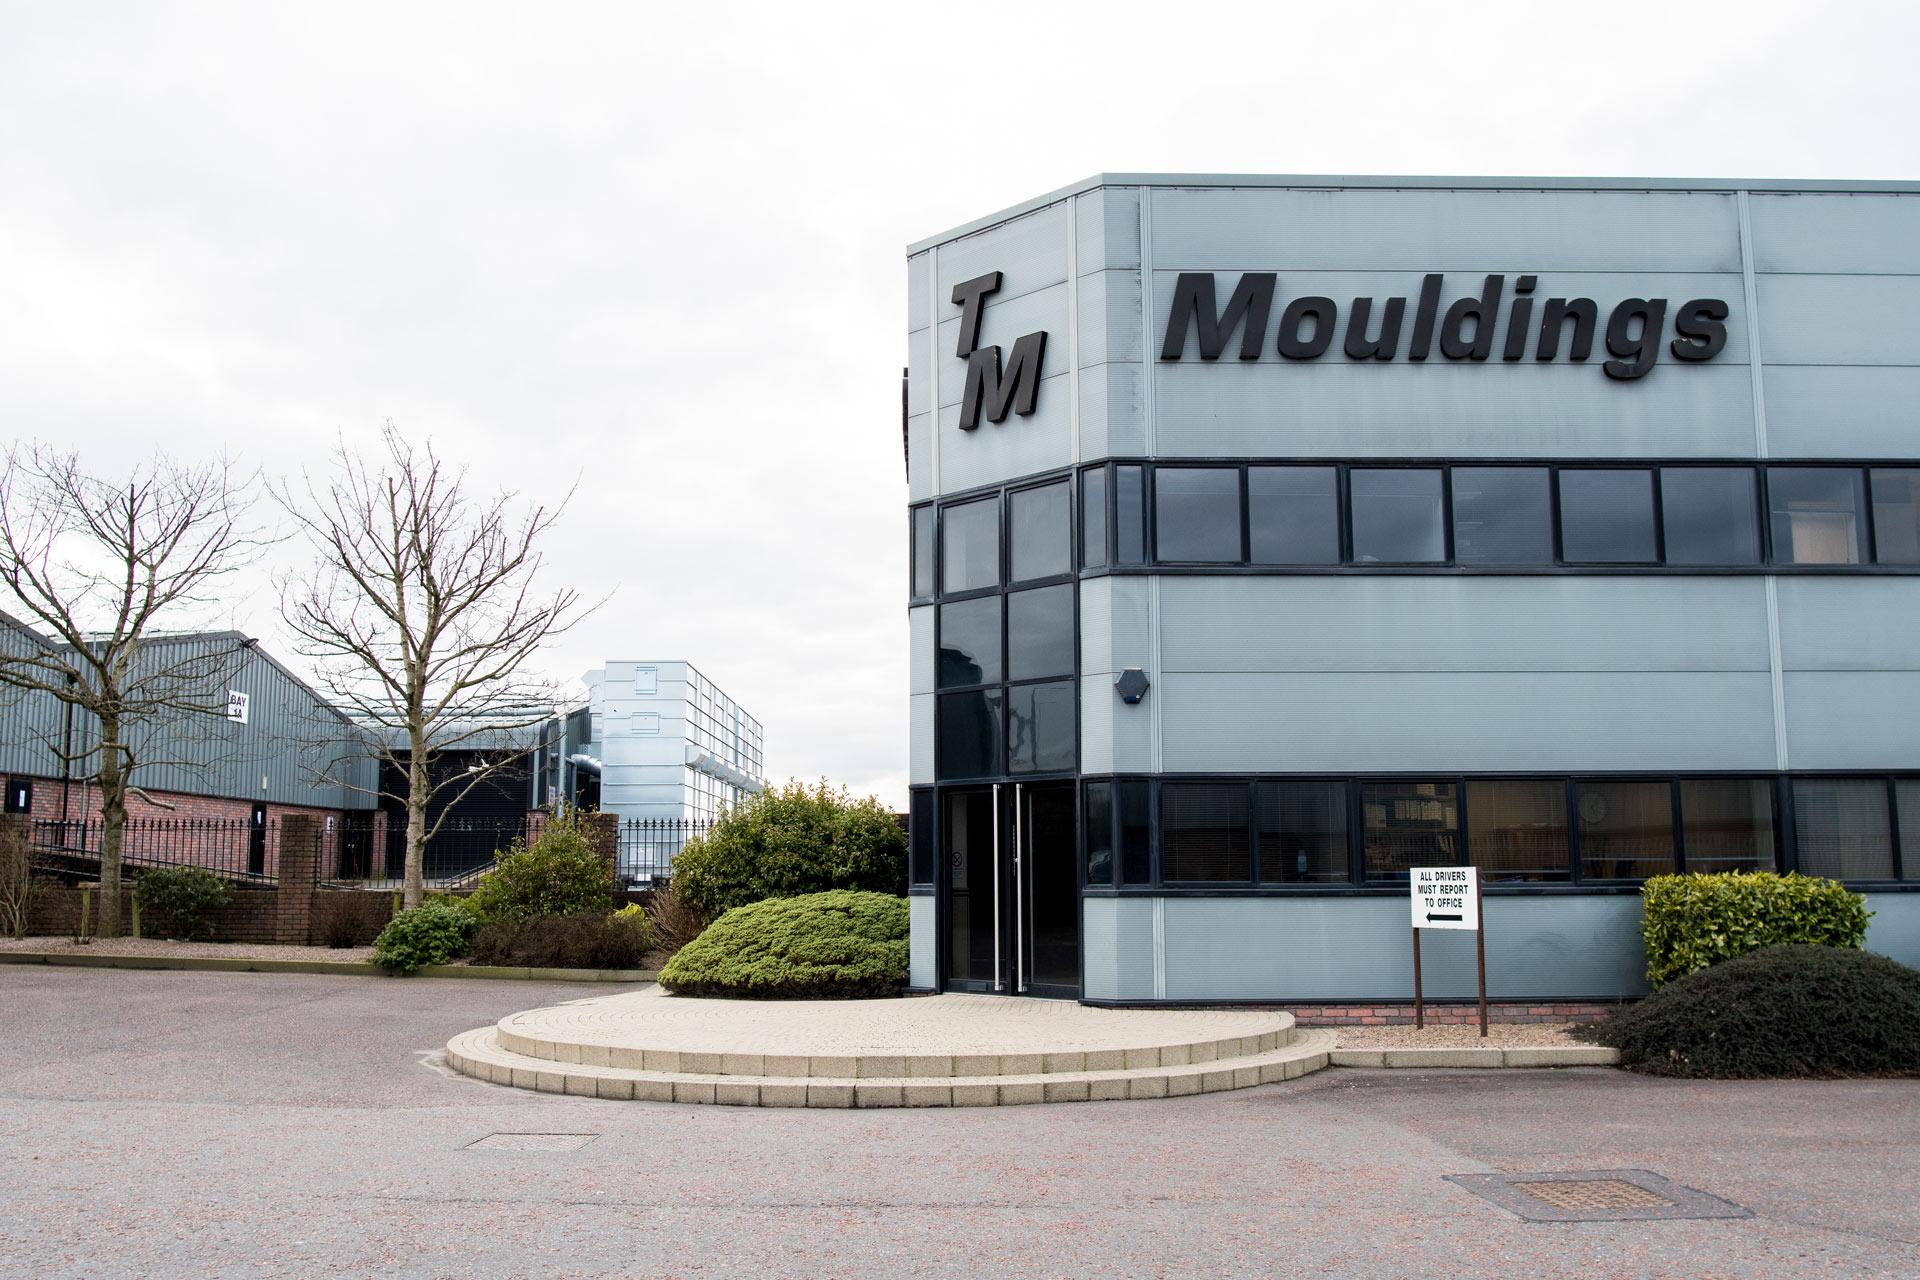 3_Modesta_Trade_Mouldings_2018_NC1_0460.jpg